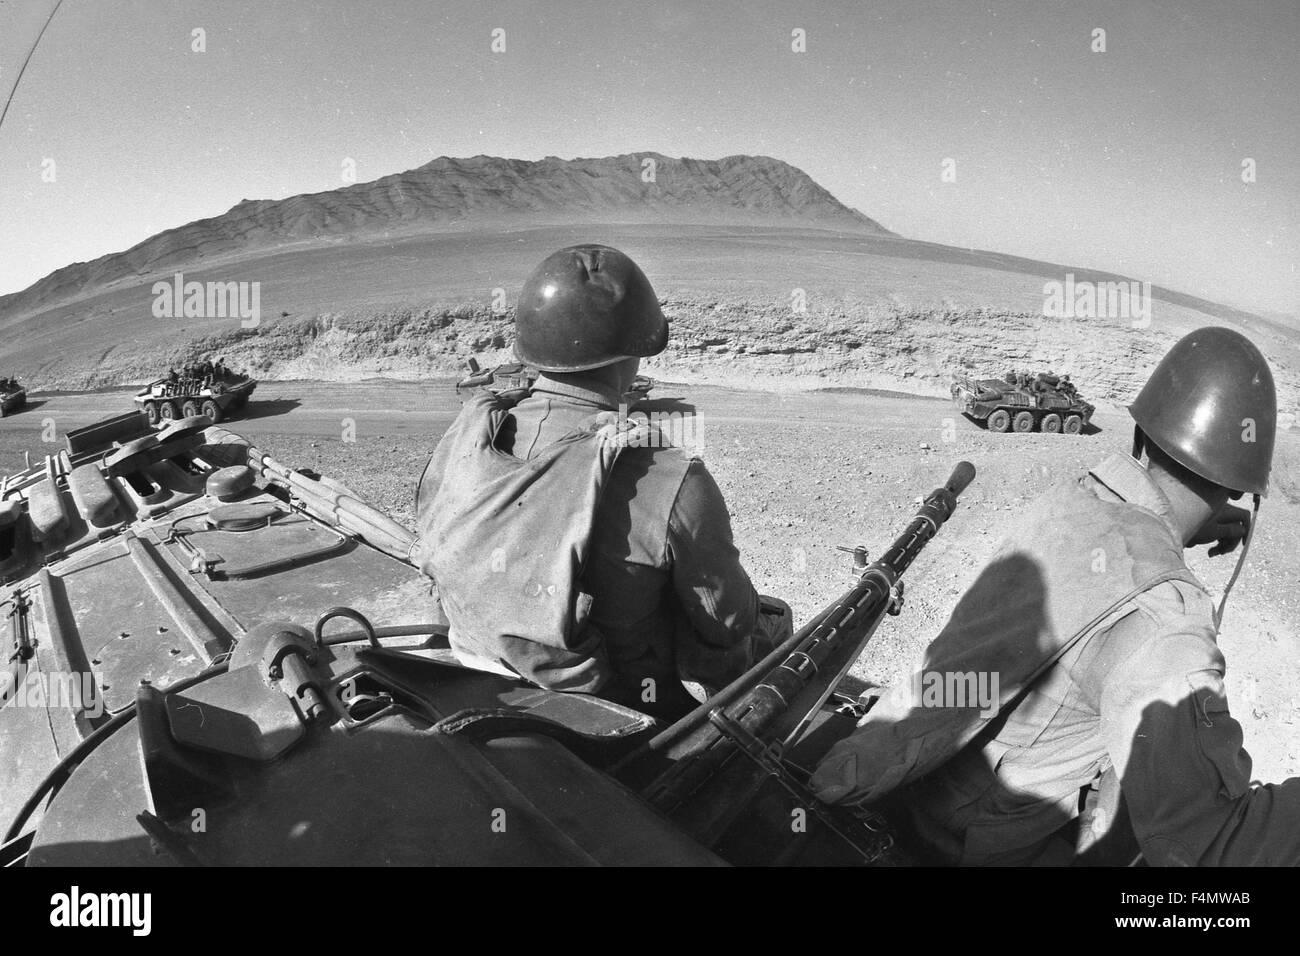 Soviet Afghanistan war - Page 6 Afghanistan-the-soviet-soldiers-near-kandahar-F4MWAB